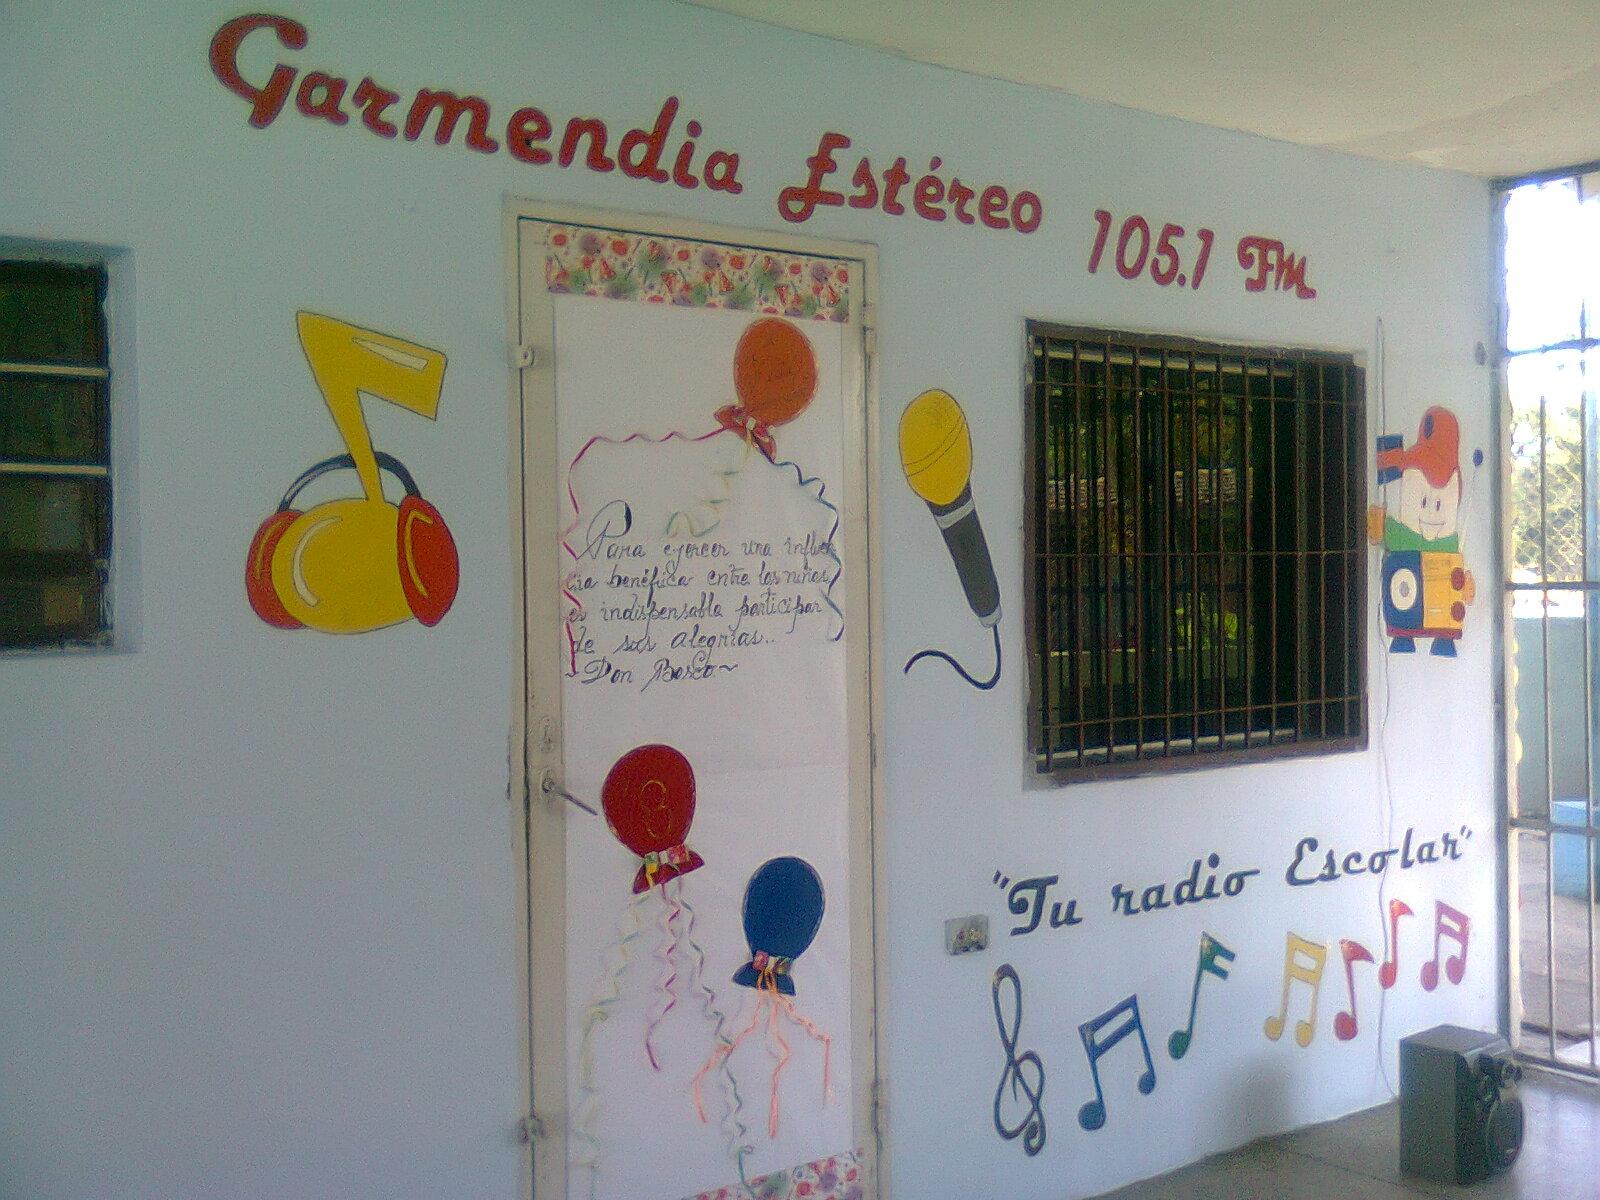 GARMENDIA ESTEREO 105.1 FM